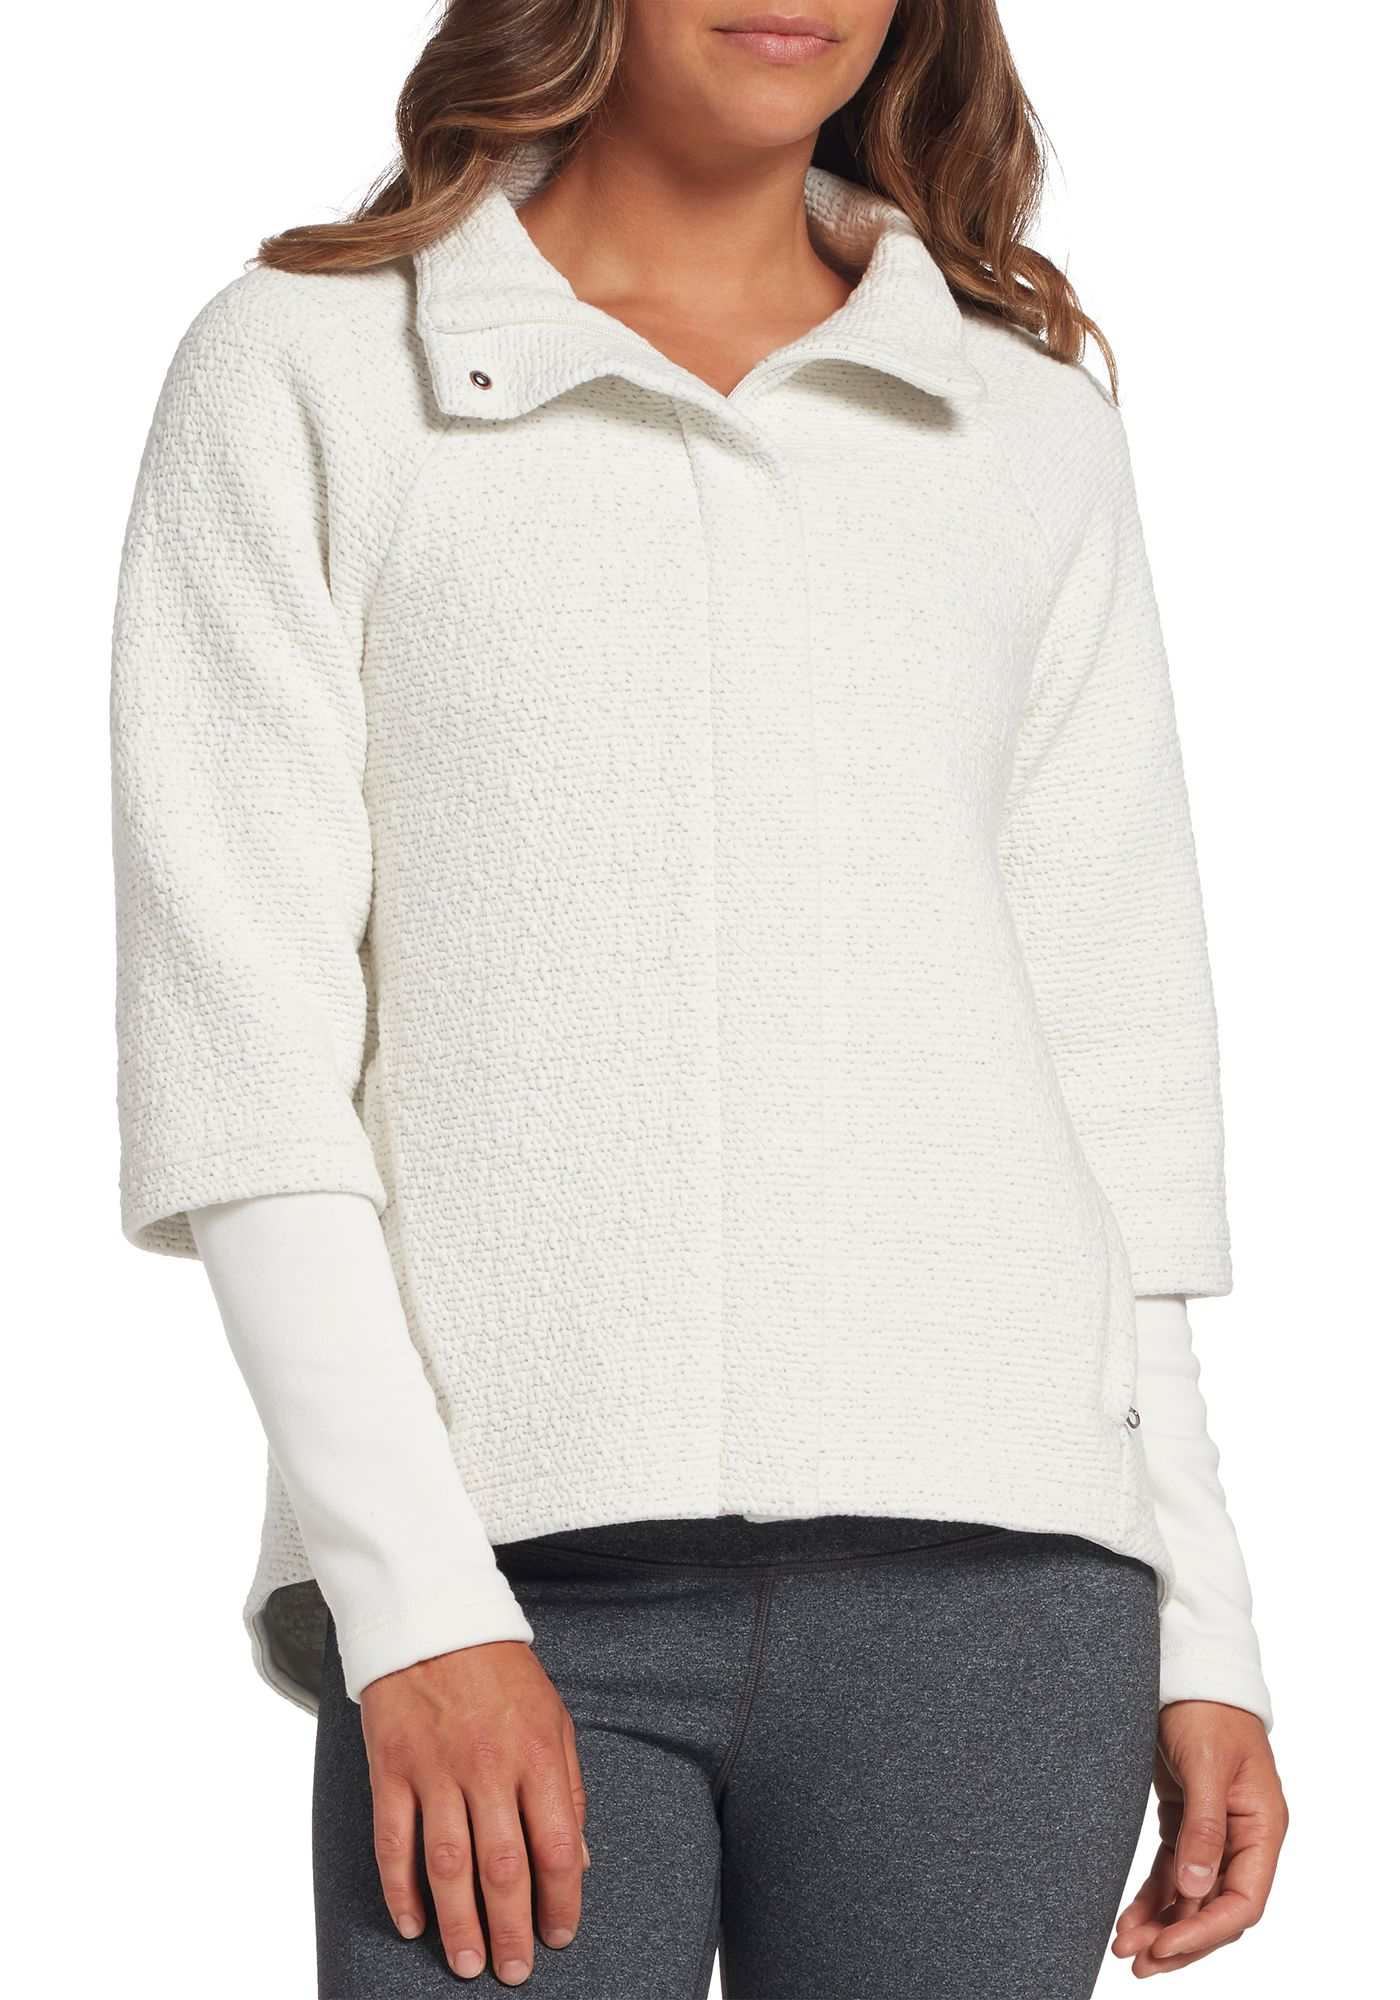 CALIA by Carrie Underwood Women's Cloud Full Zip Jacket